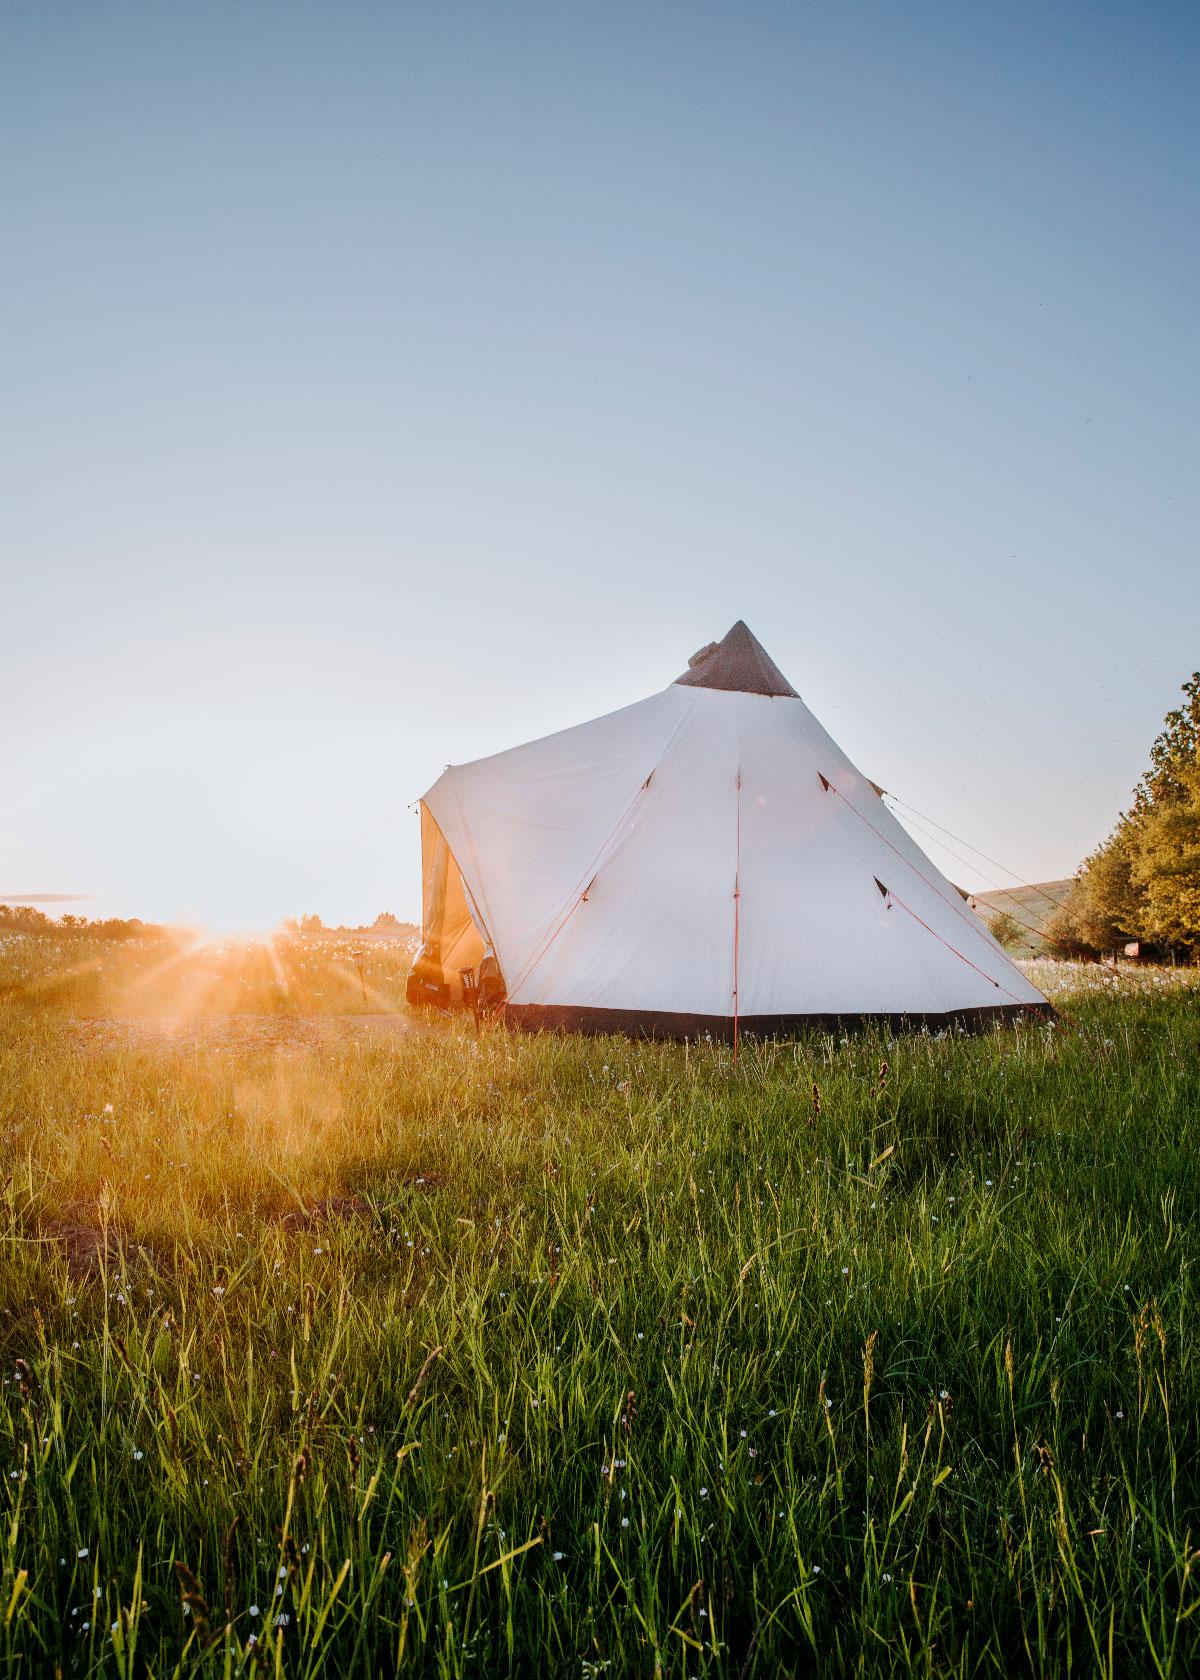 Overnatning i glamping-telt på Skjoldungestien